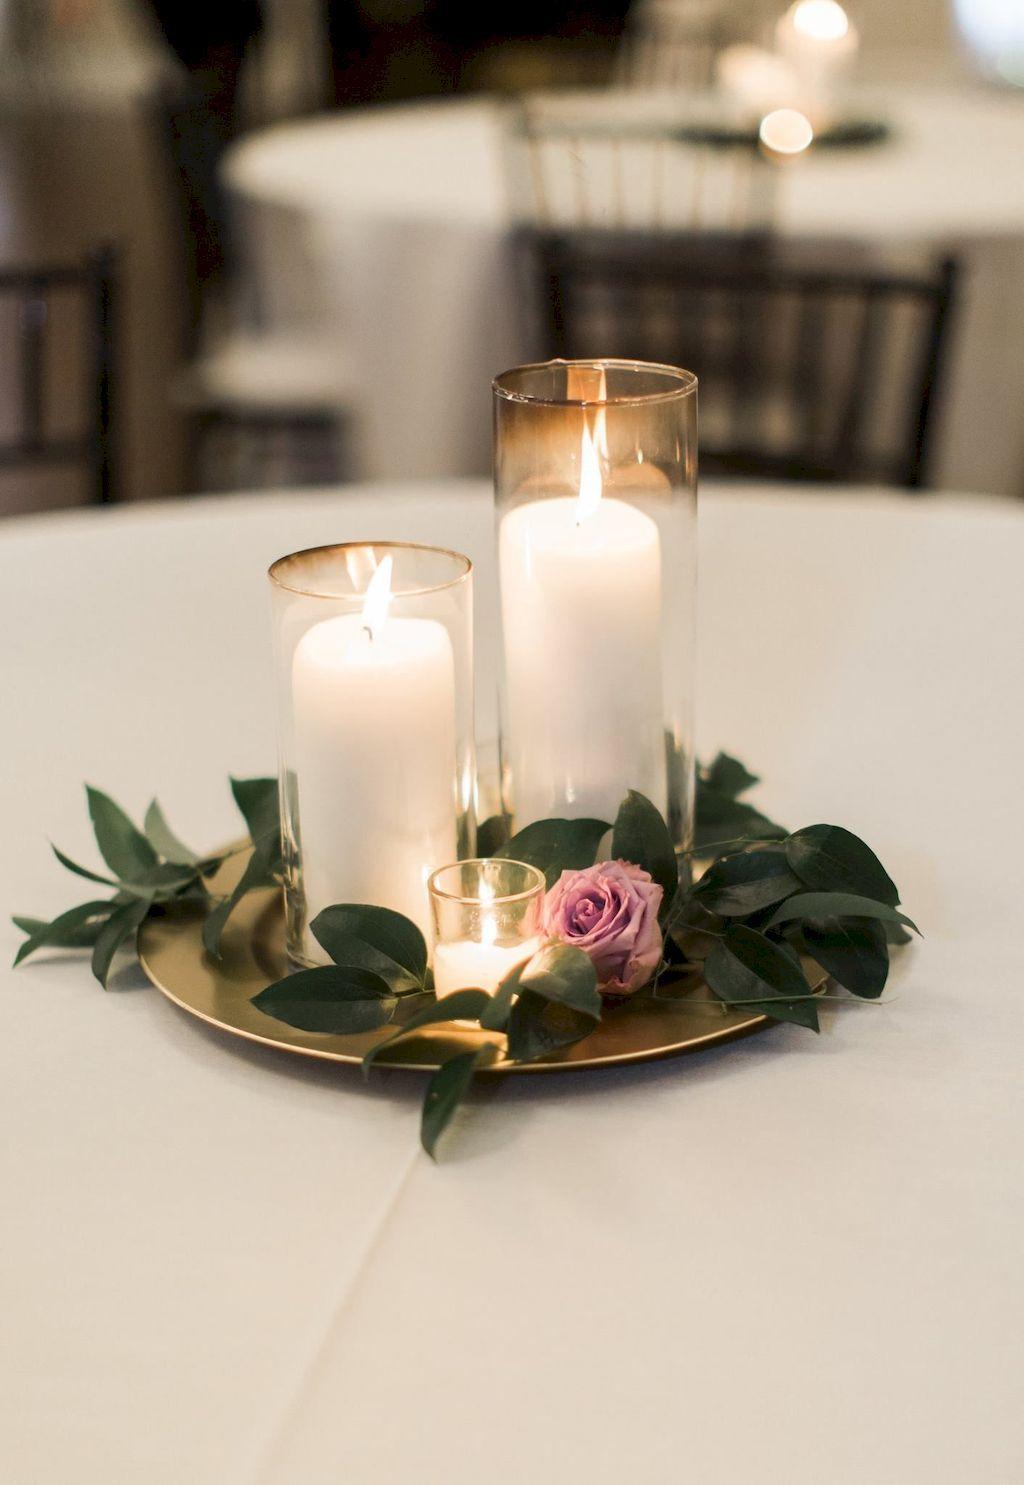 87 Simple and Easy Wedding Centerpiece Ideas | sisustaminen